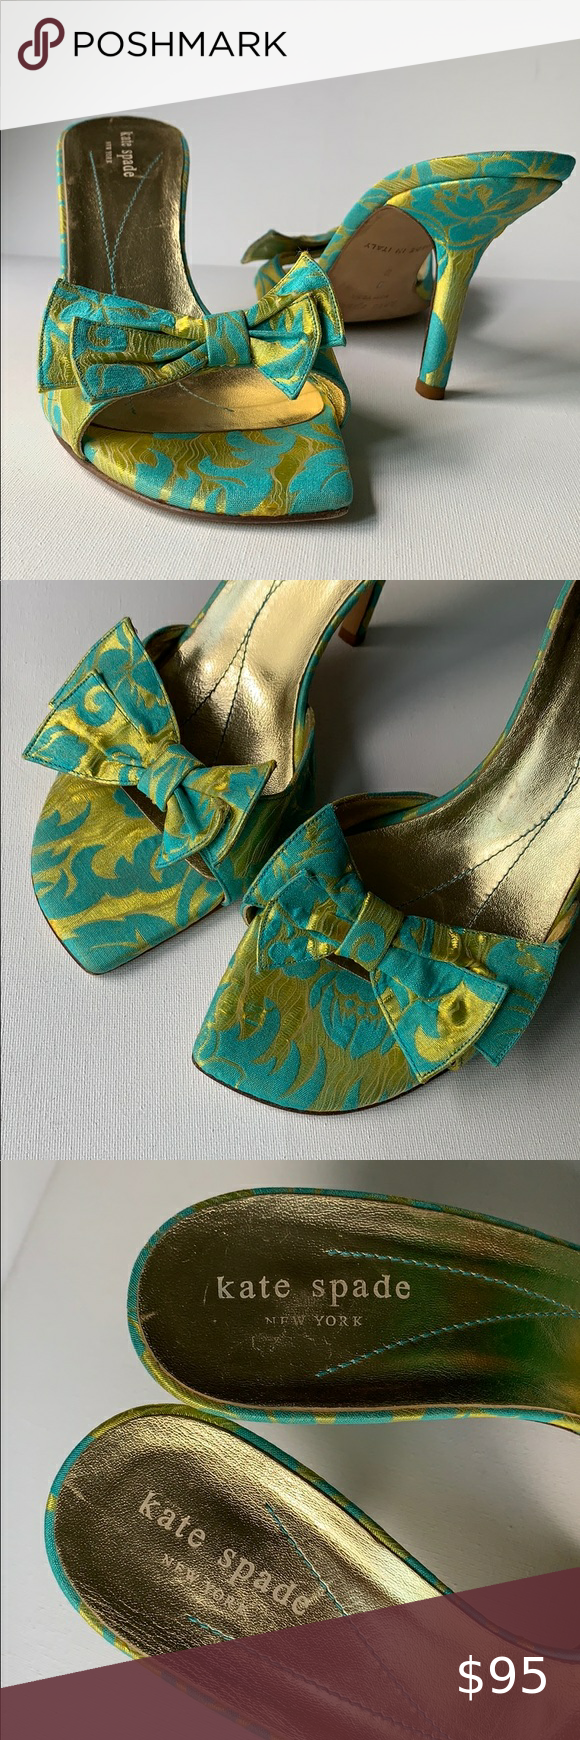 Kate Spade Brocade Bow Heel Slides Green Blue Kate Spade Brocade Bow Heel Slides...